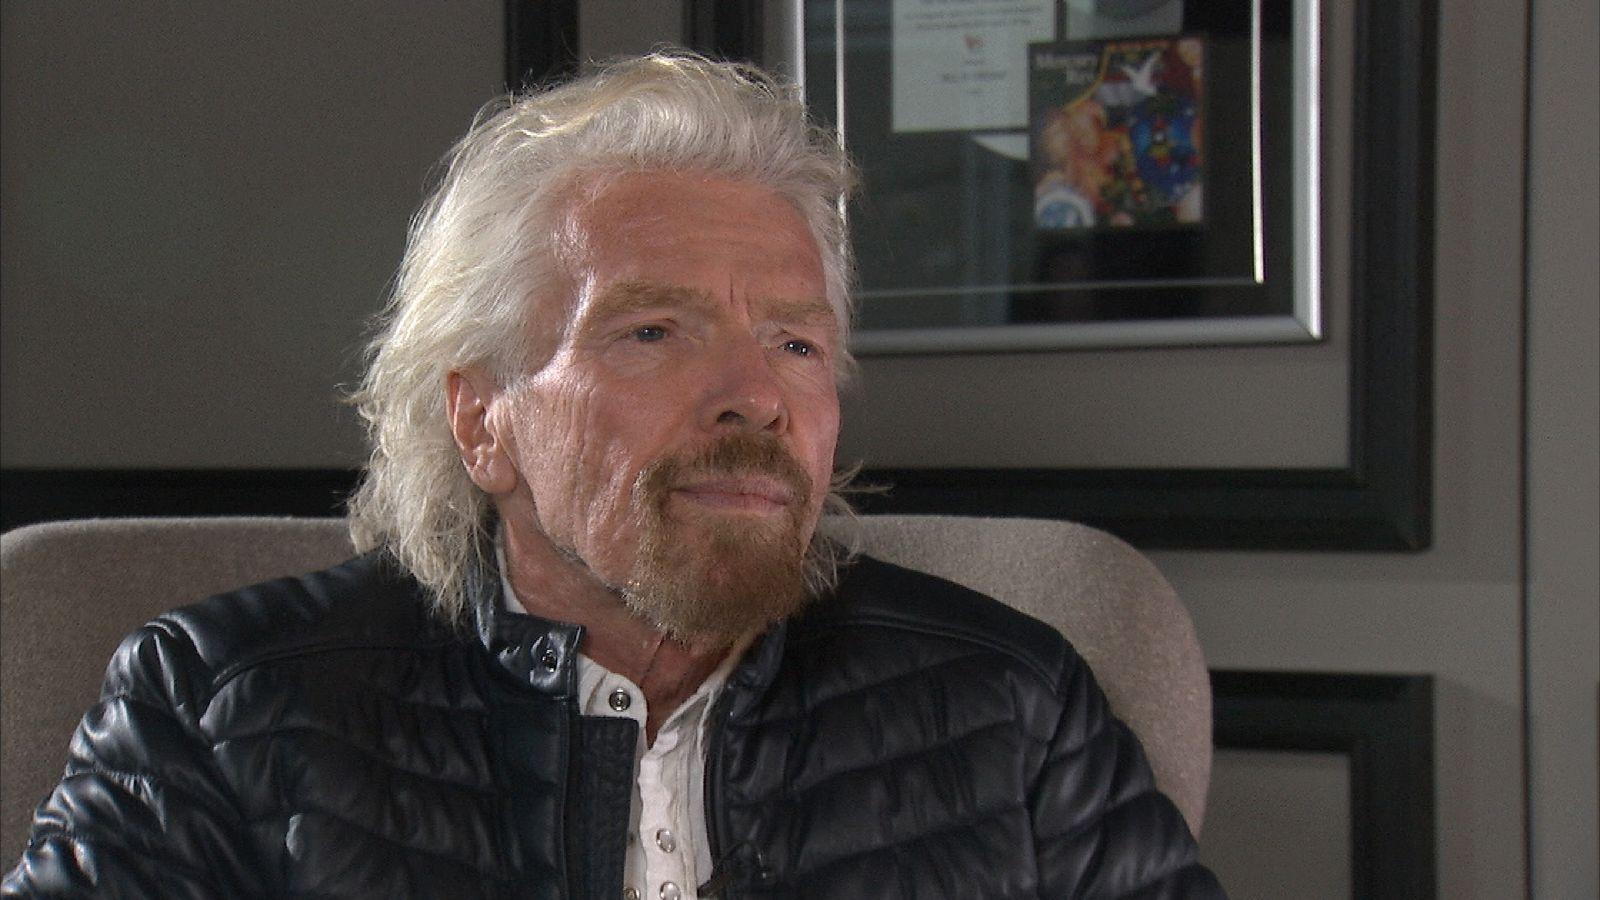 Richard Branson speaks with Sky's Dermot Murnaghan about ocean pollution.